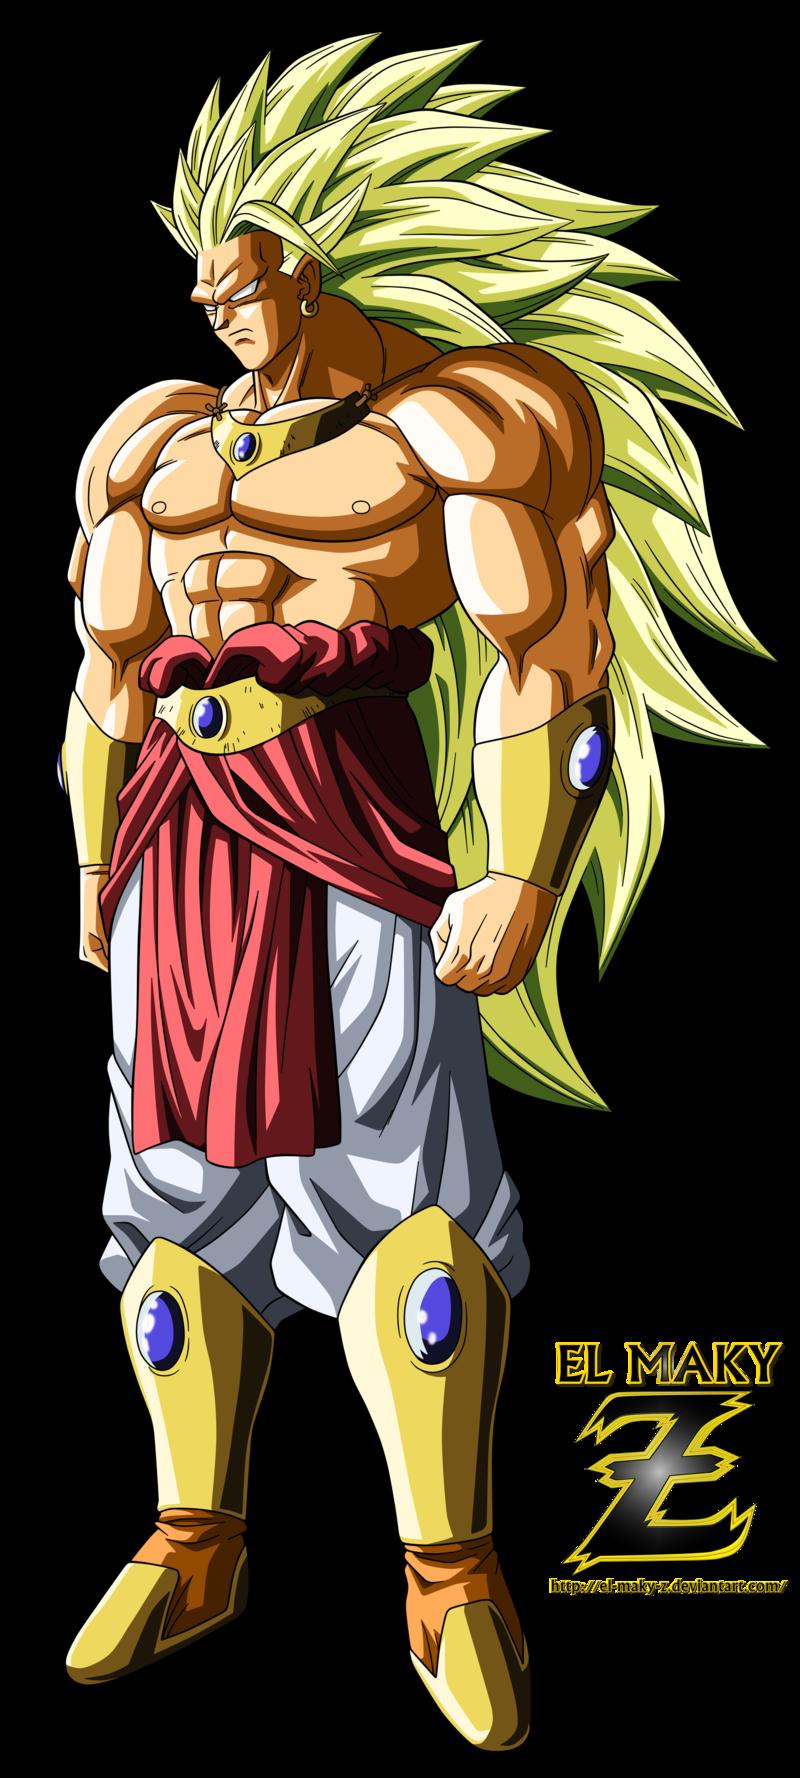 Broly Legendary Super Saiyan 3 by el-maky-z.deviantart.com ...